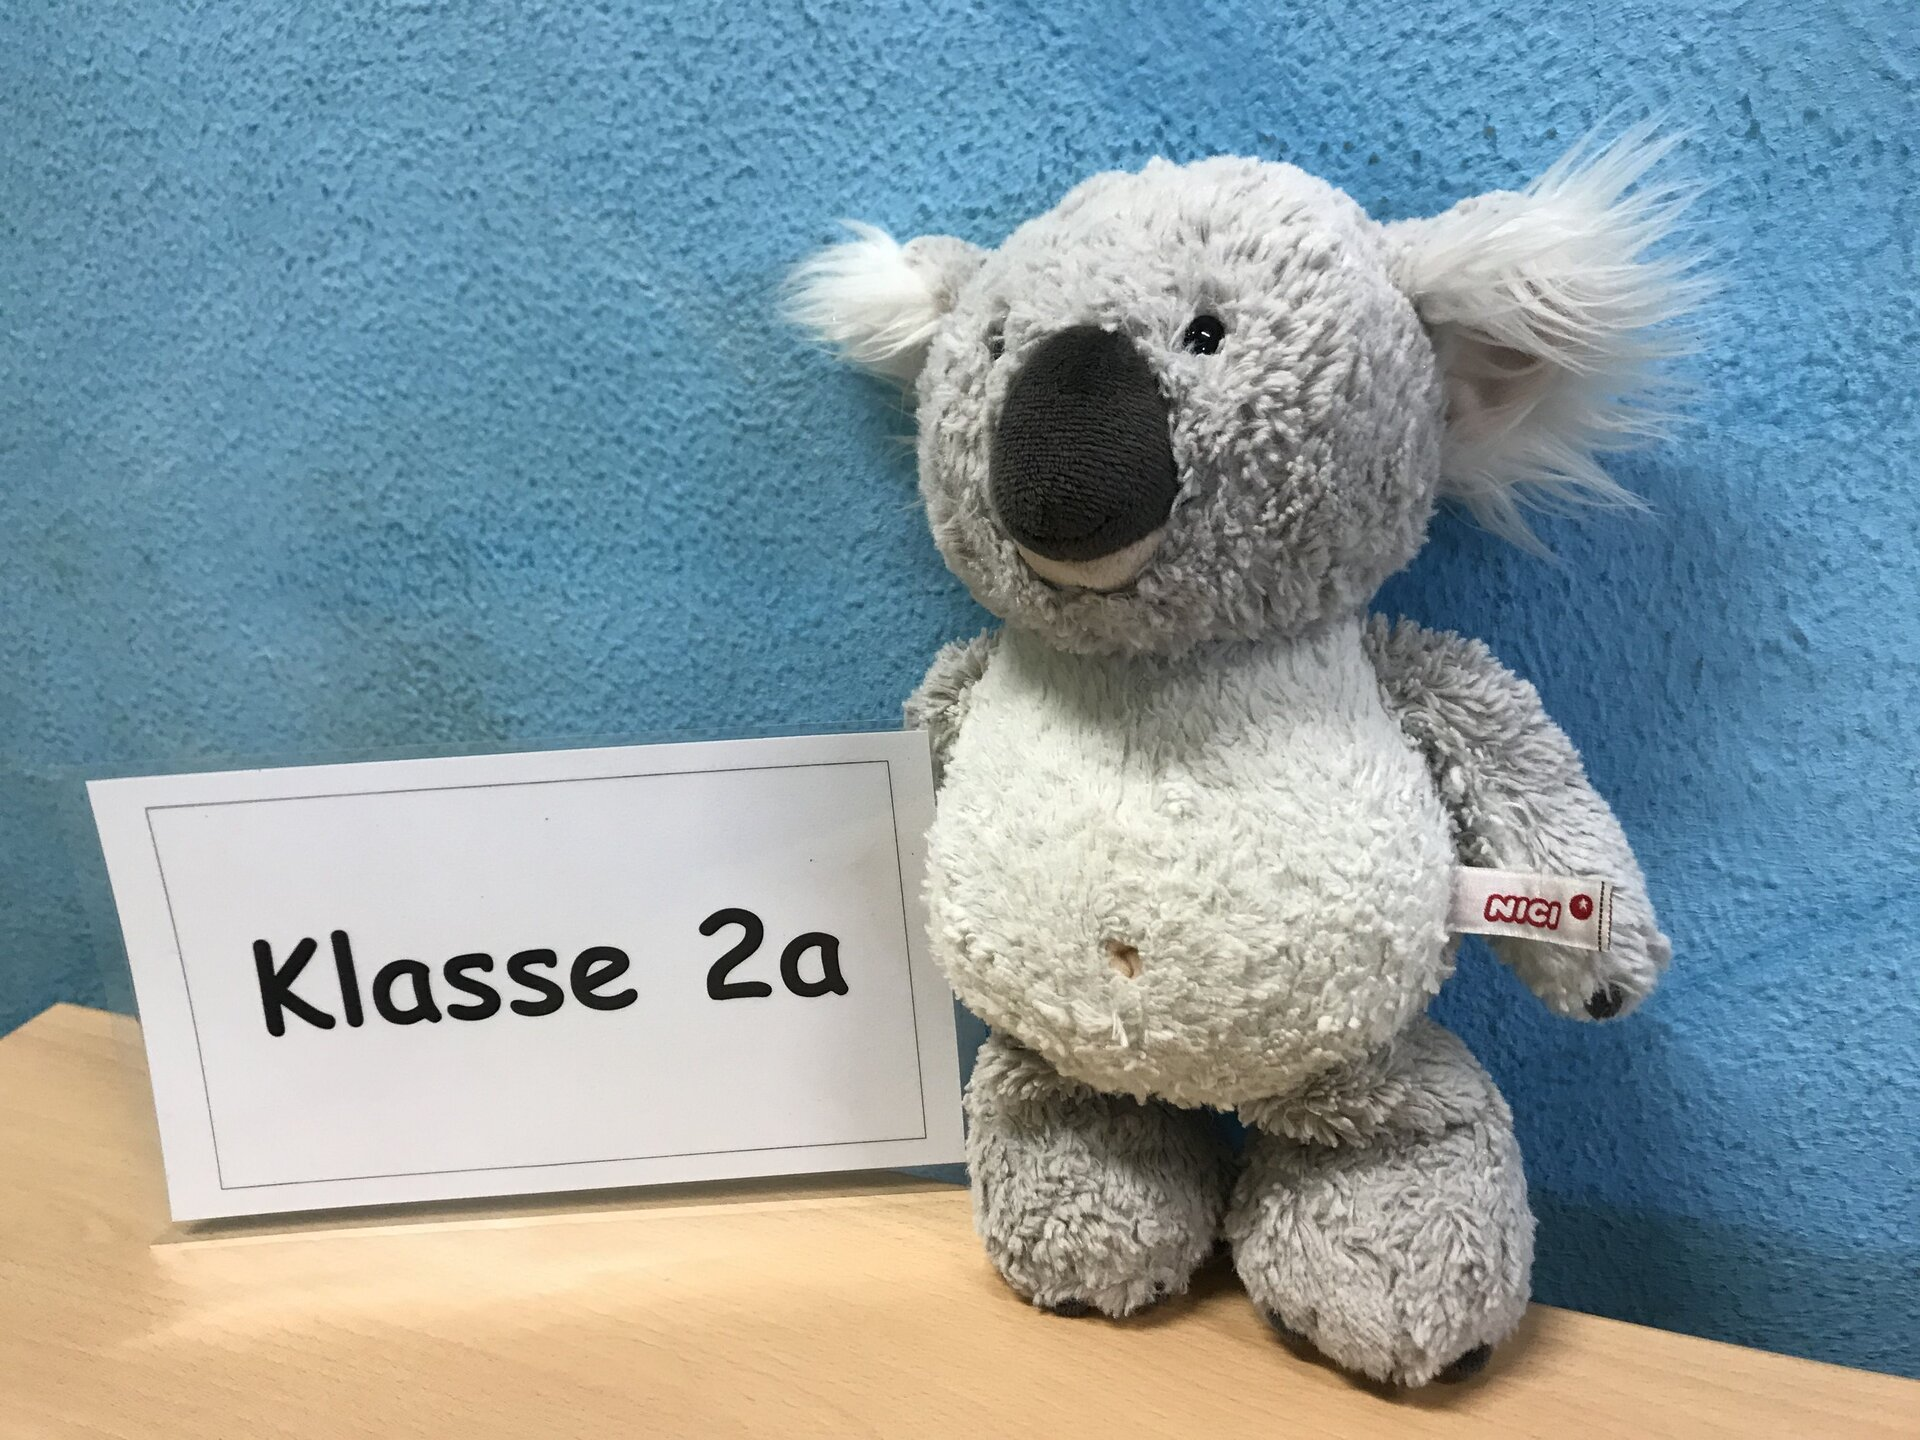 Klasse 2a Koala